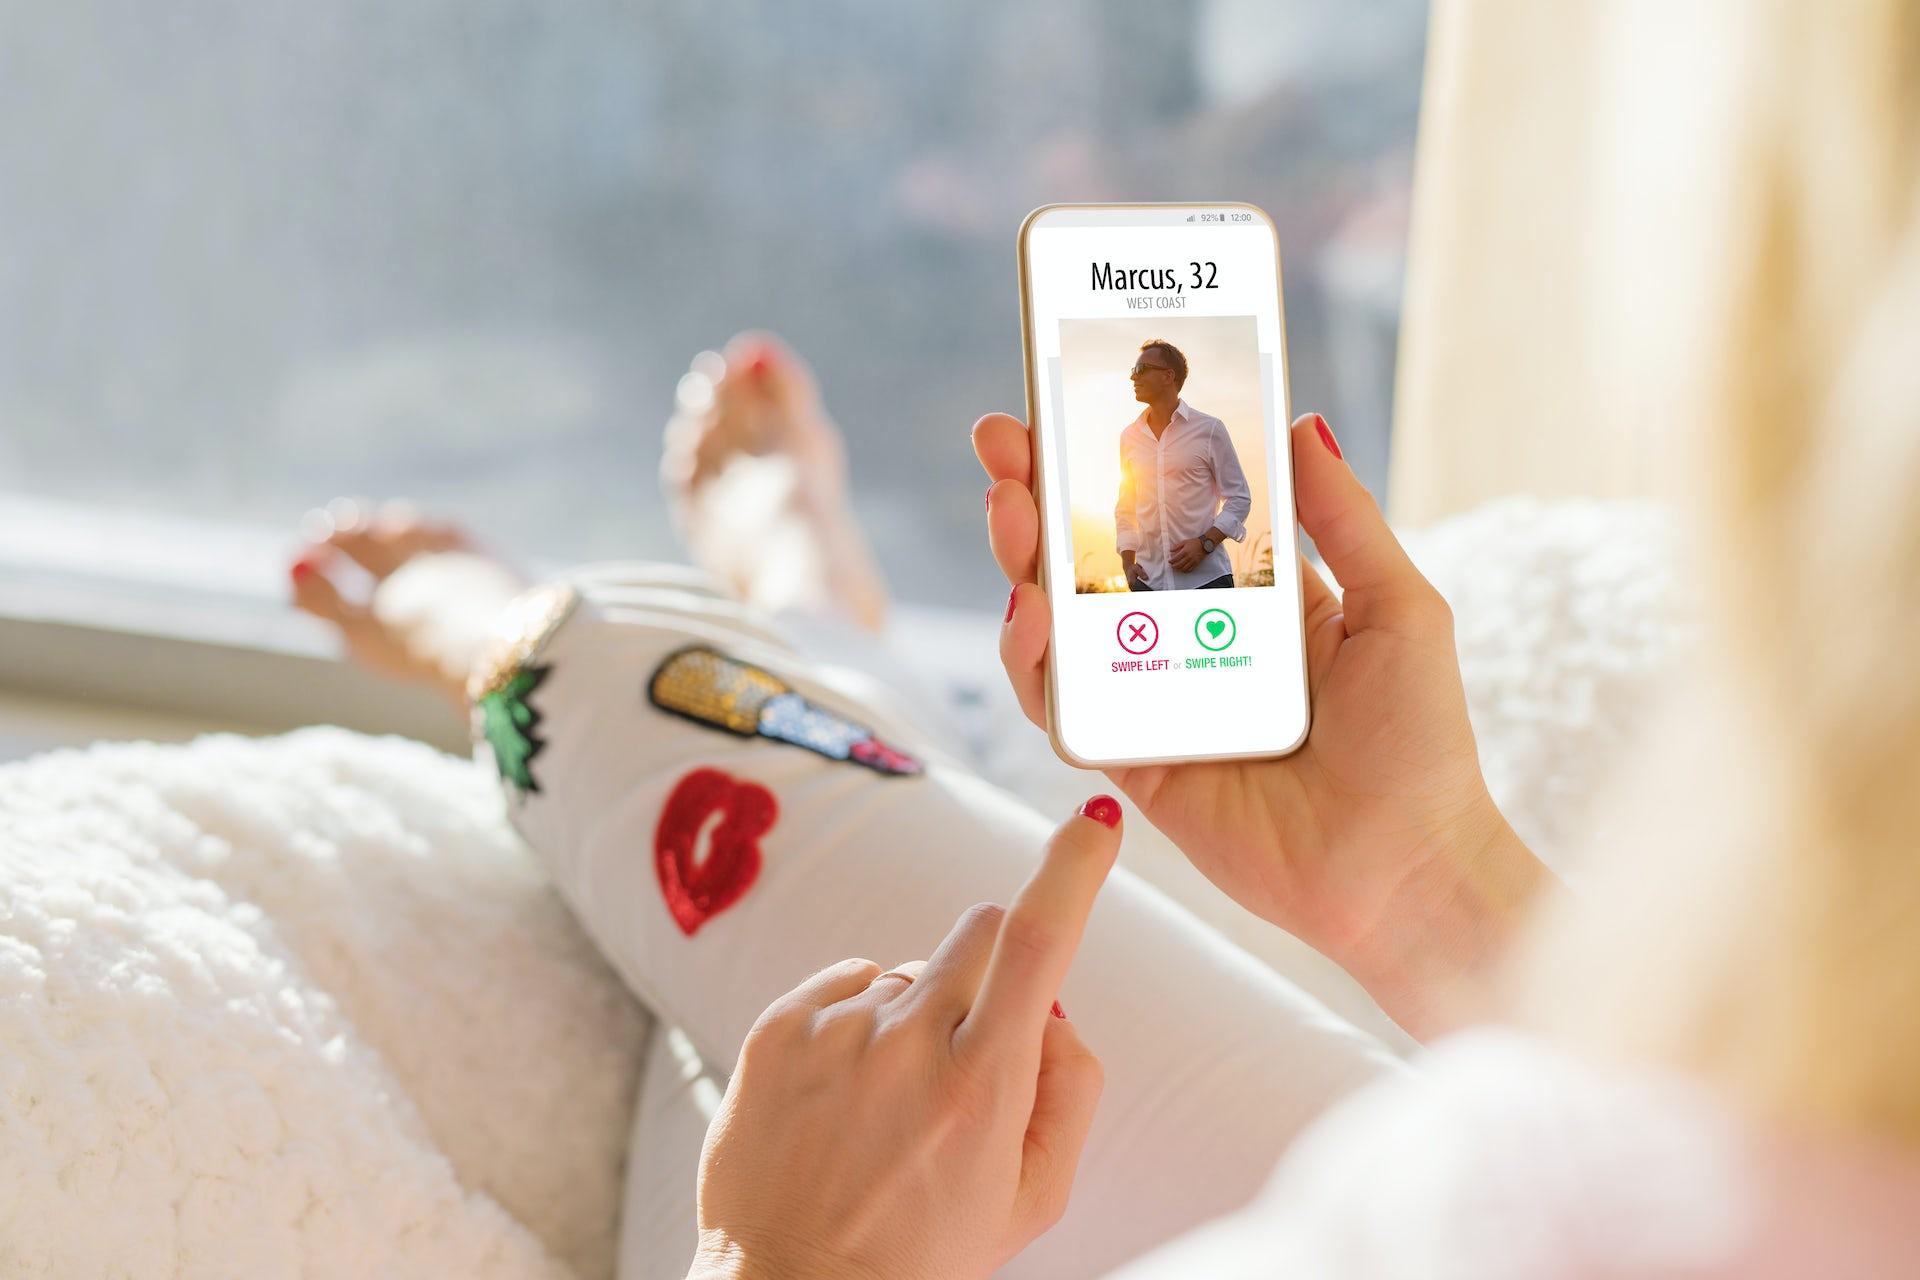 Russia norvegia hochei online dating